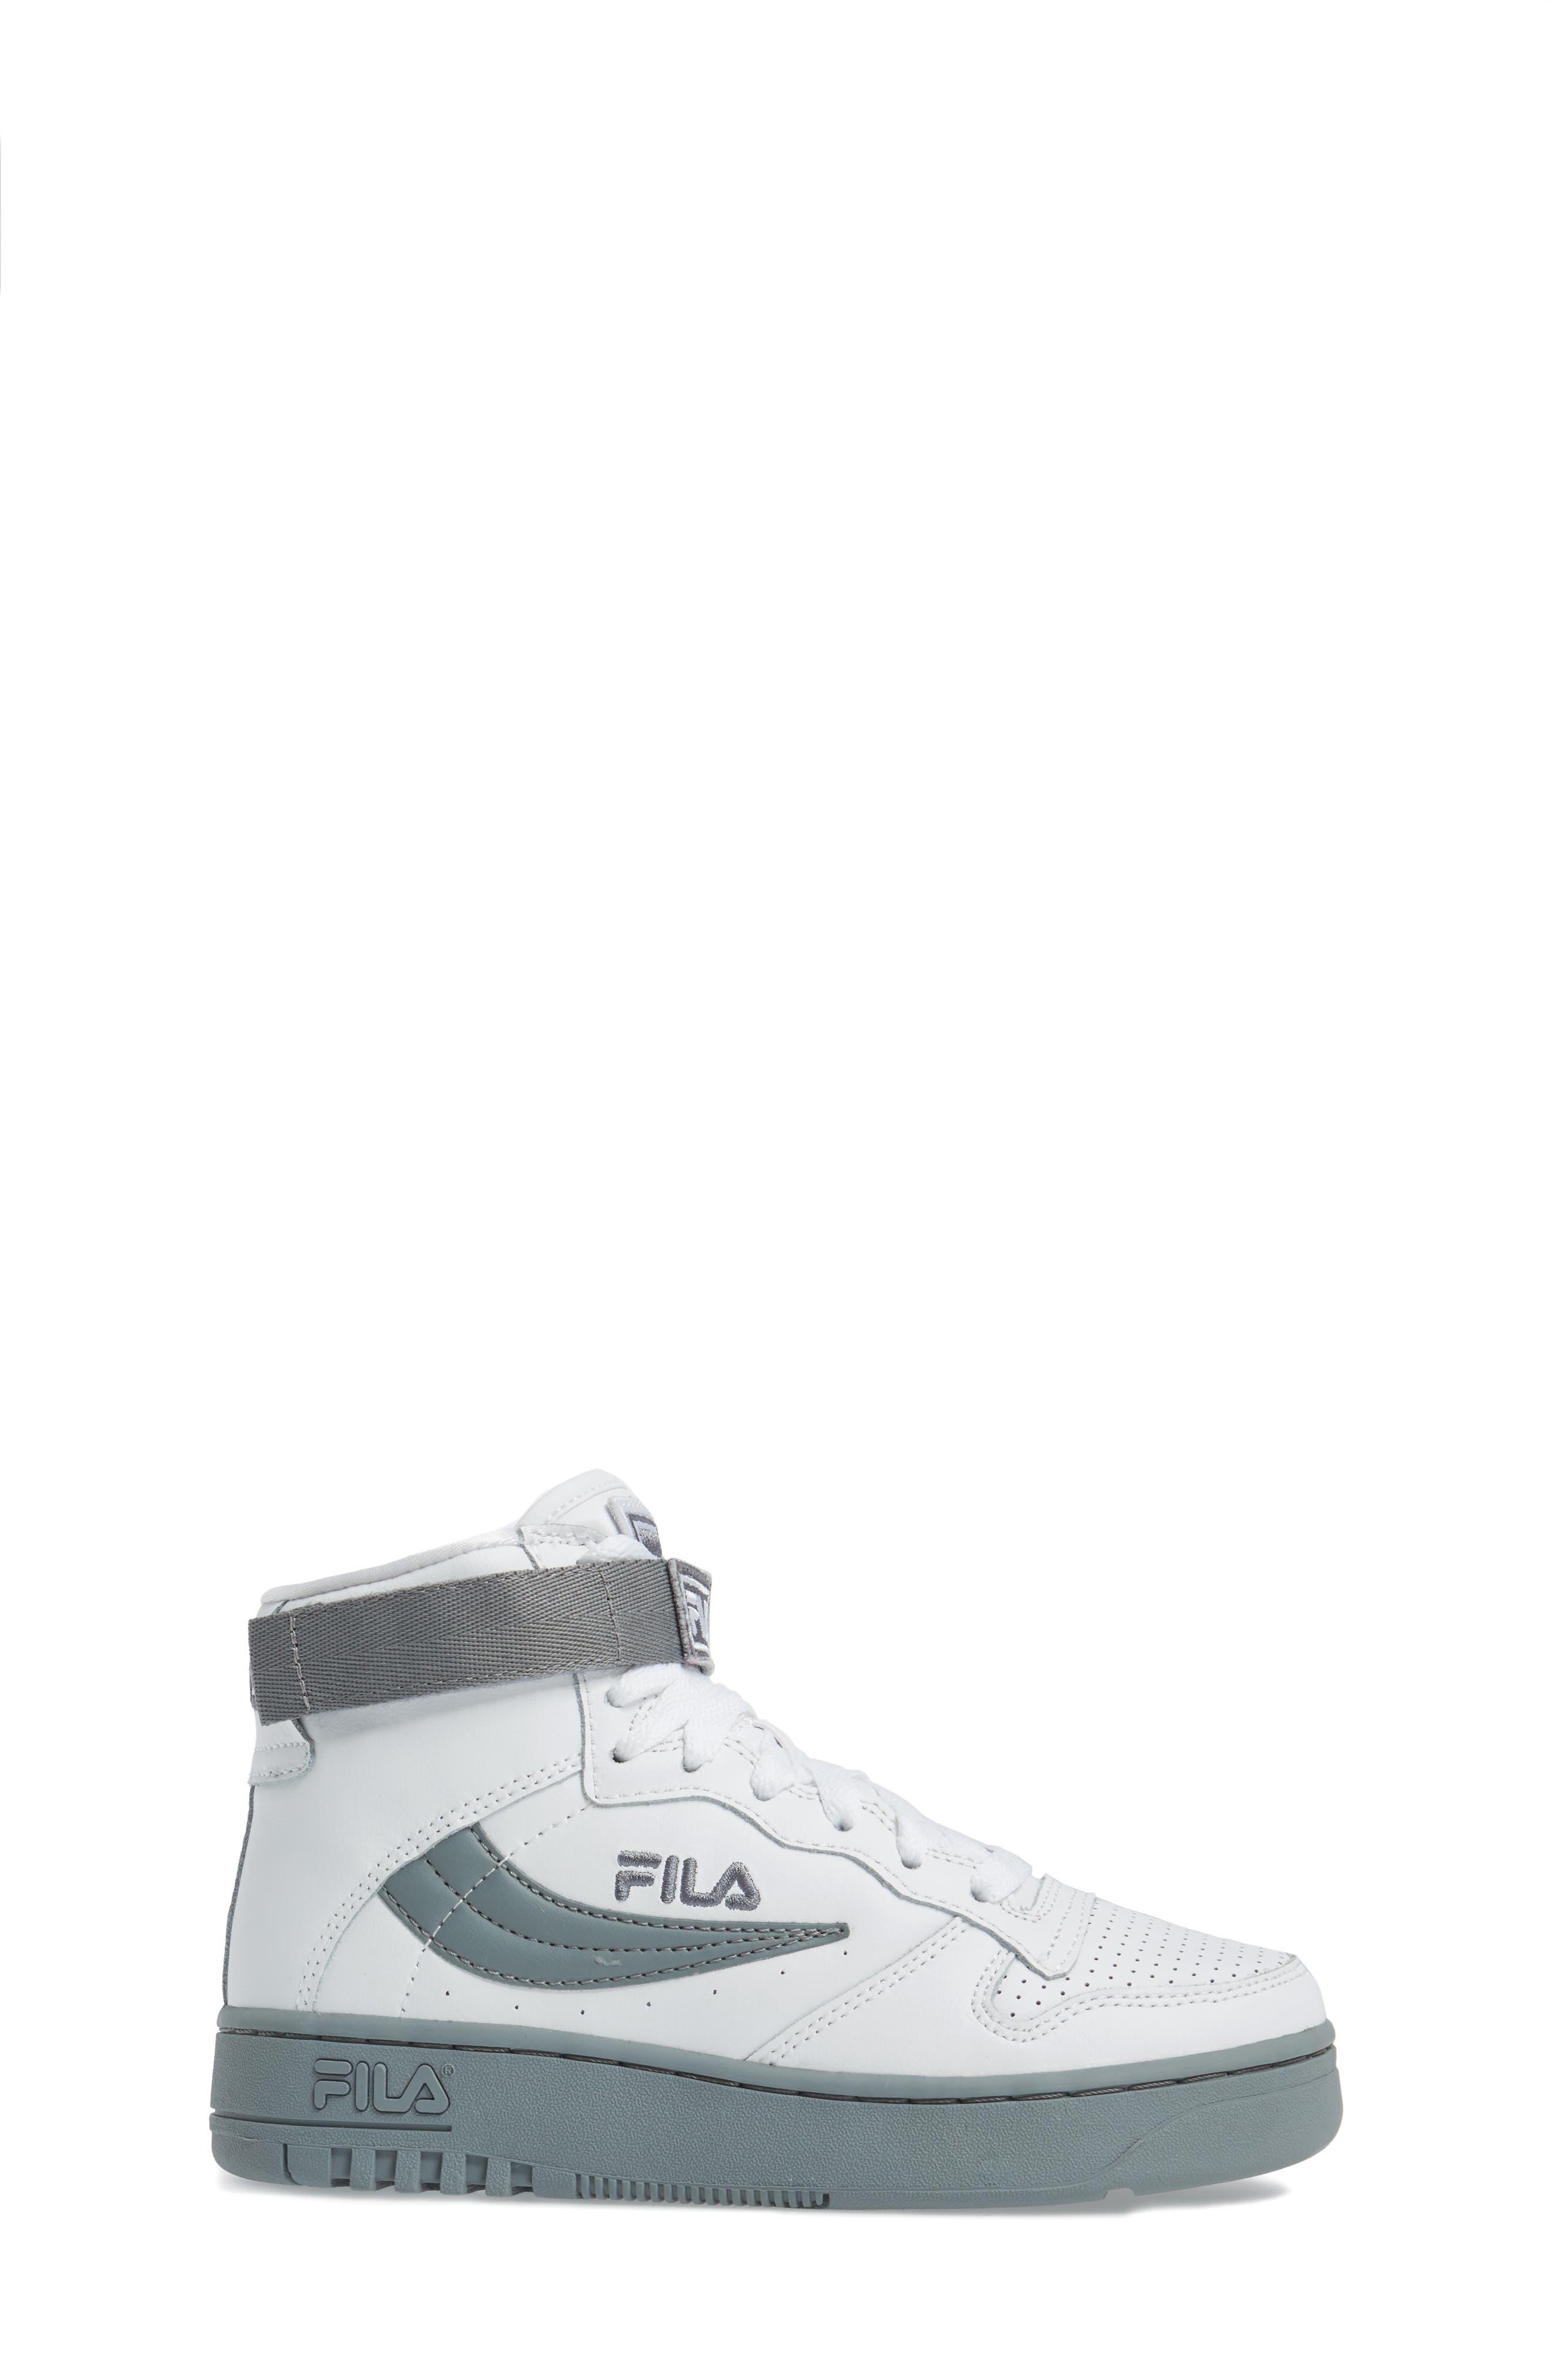 Alternate Image 3  - FILA FX-100 High Top Sneaker (Big Kid)